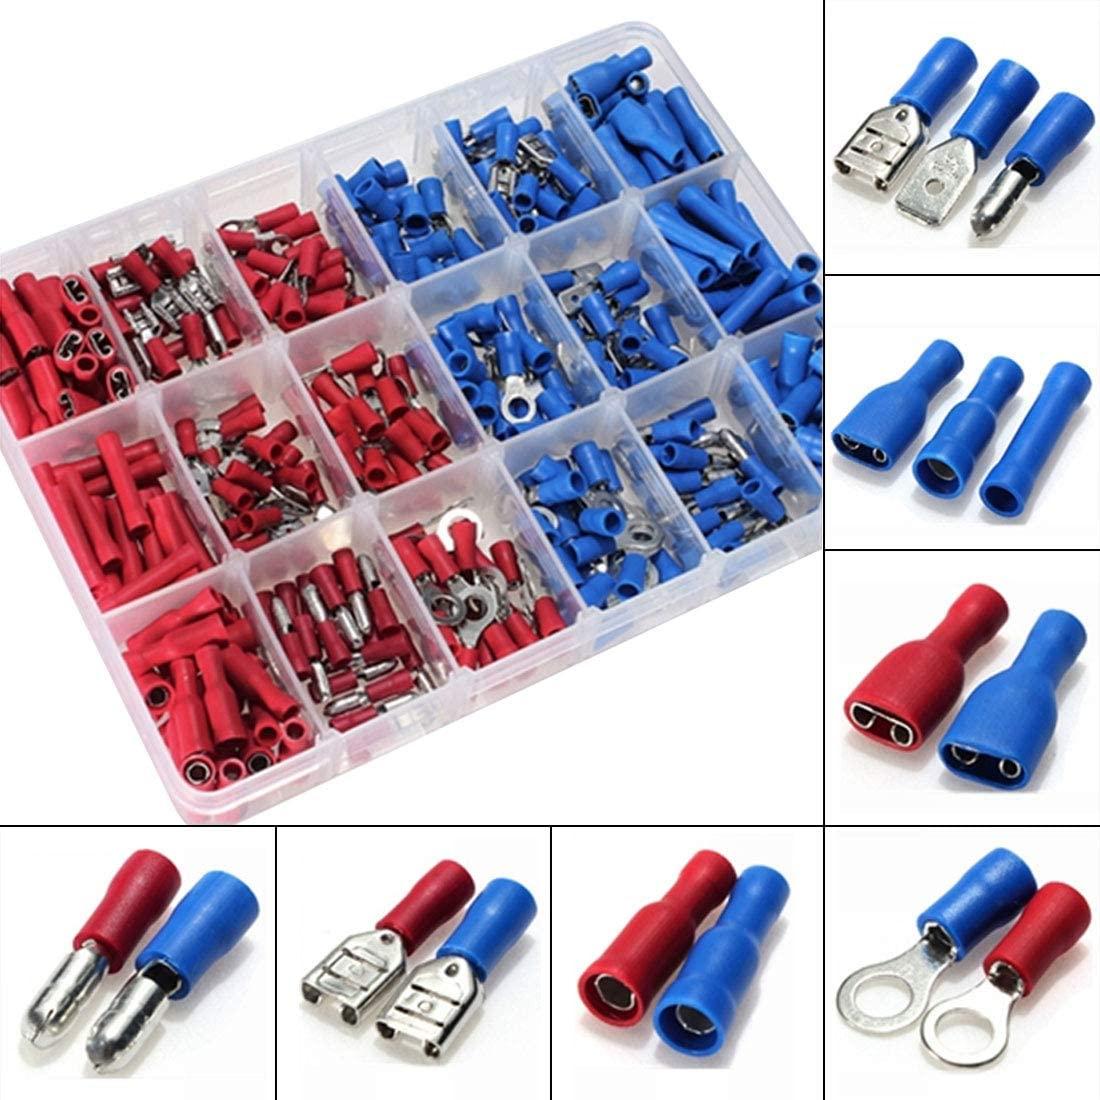 Davitu Electrical Equipments Supplies - 360pcs Insulated Terminals Crimp Connector Butt Spade Ring Fork Set